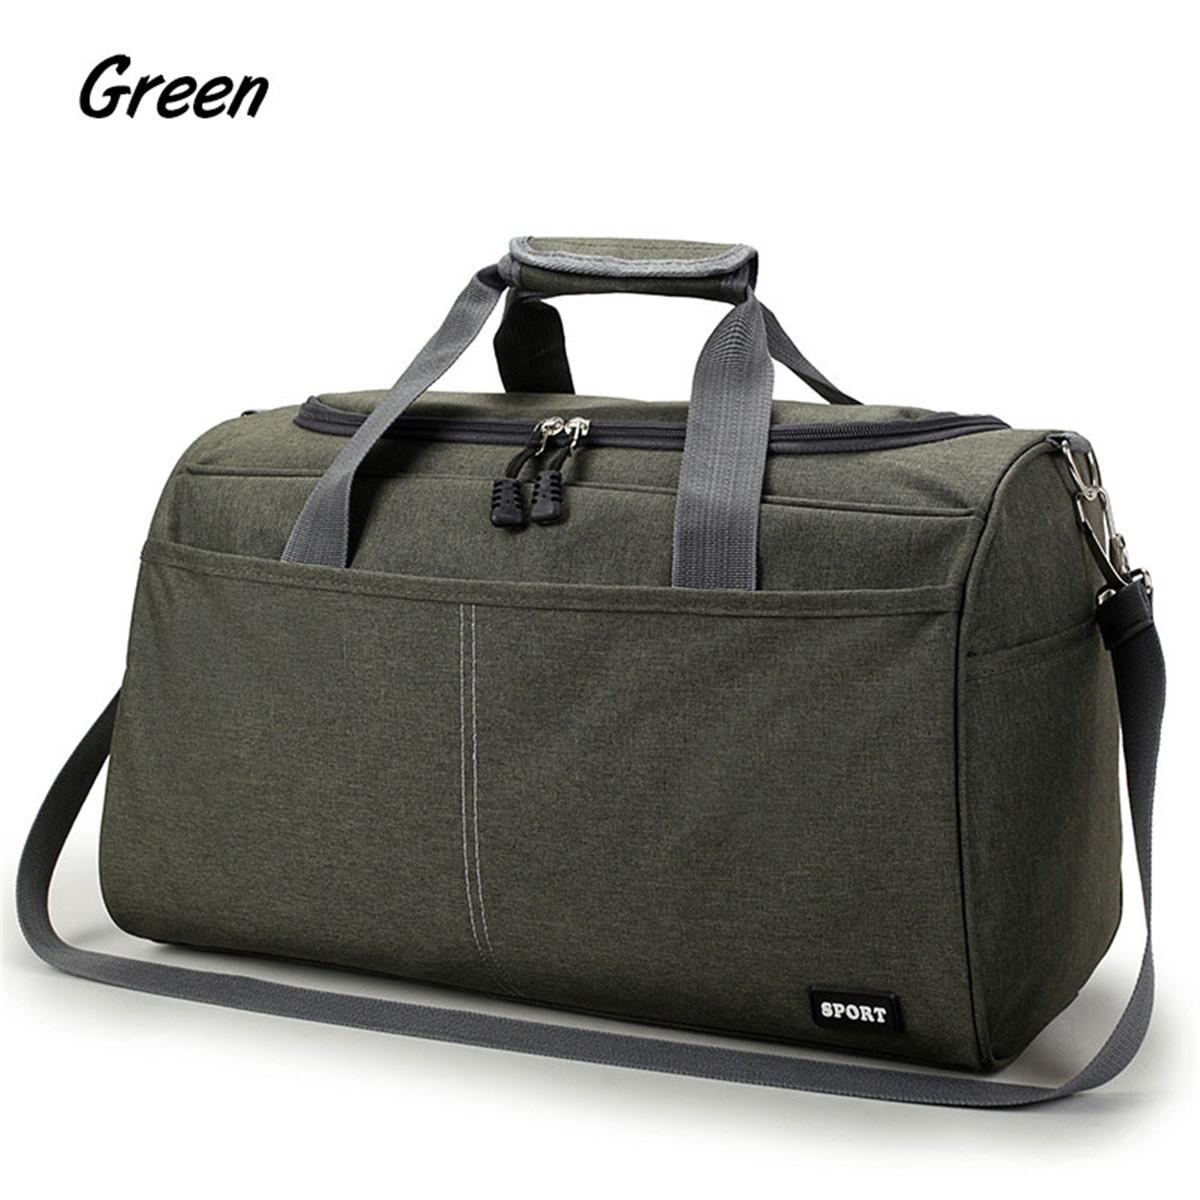 Unisex-Men-Women-Nylon-Travel-Duffel-Weekender-Gym-Sport-Holdall-Luggage-Bag